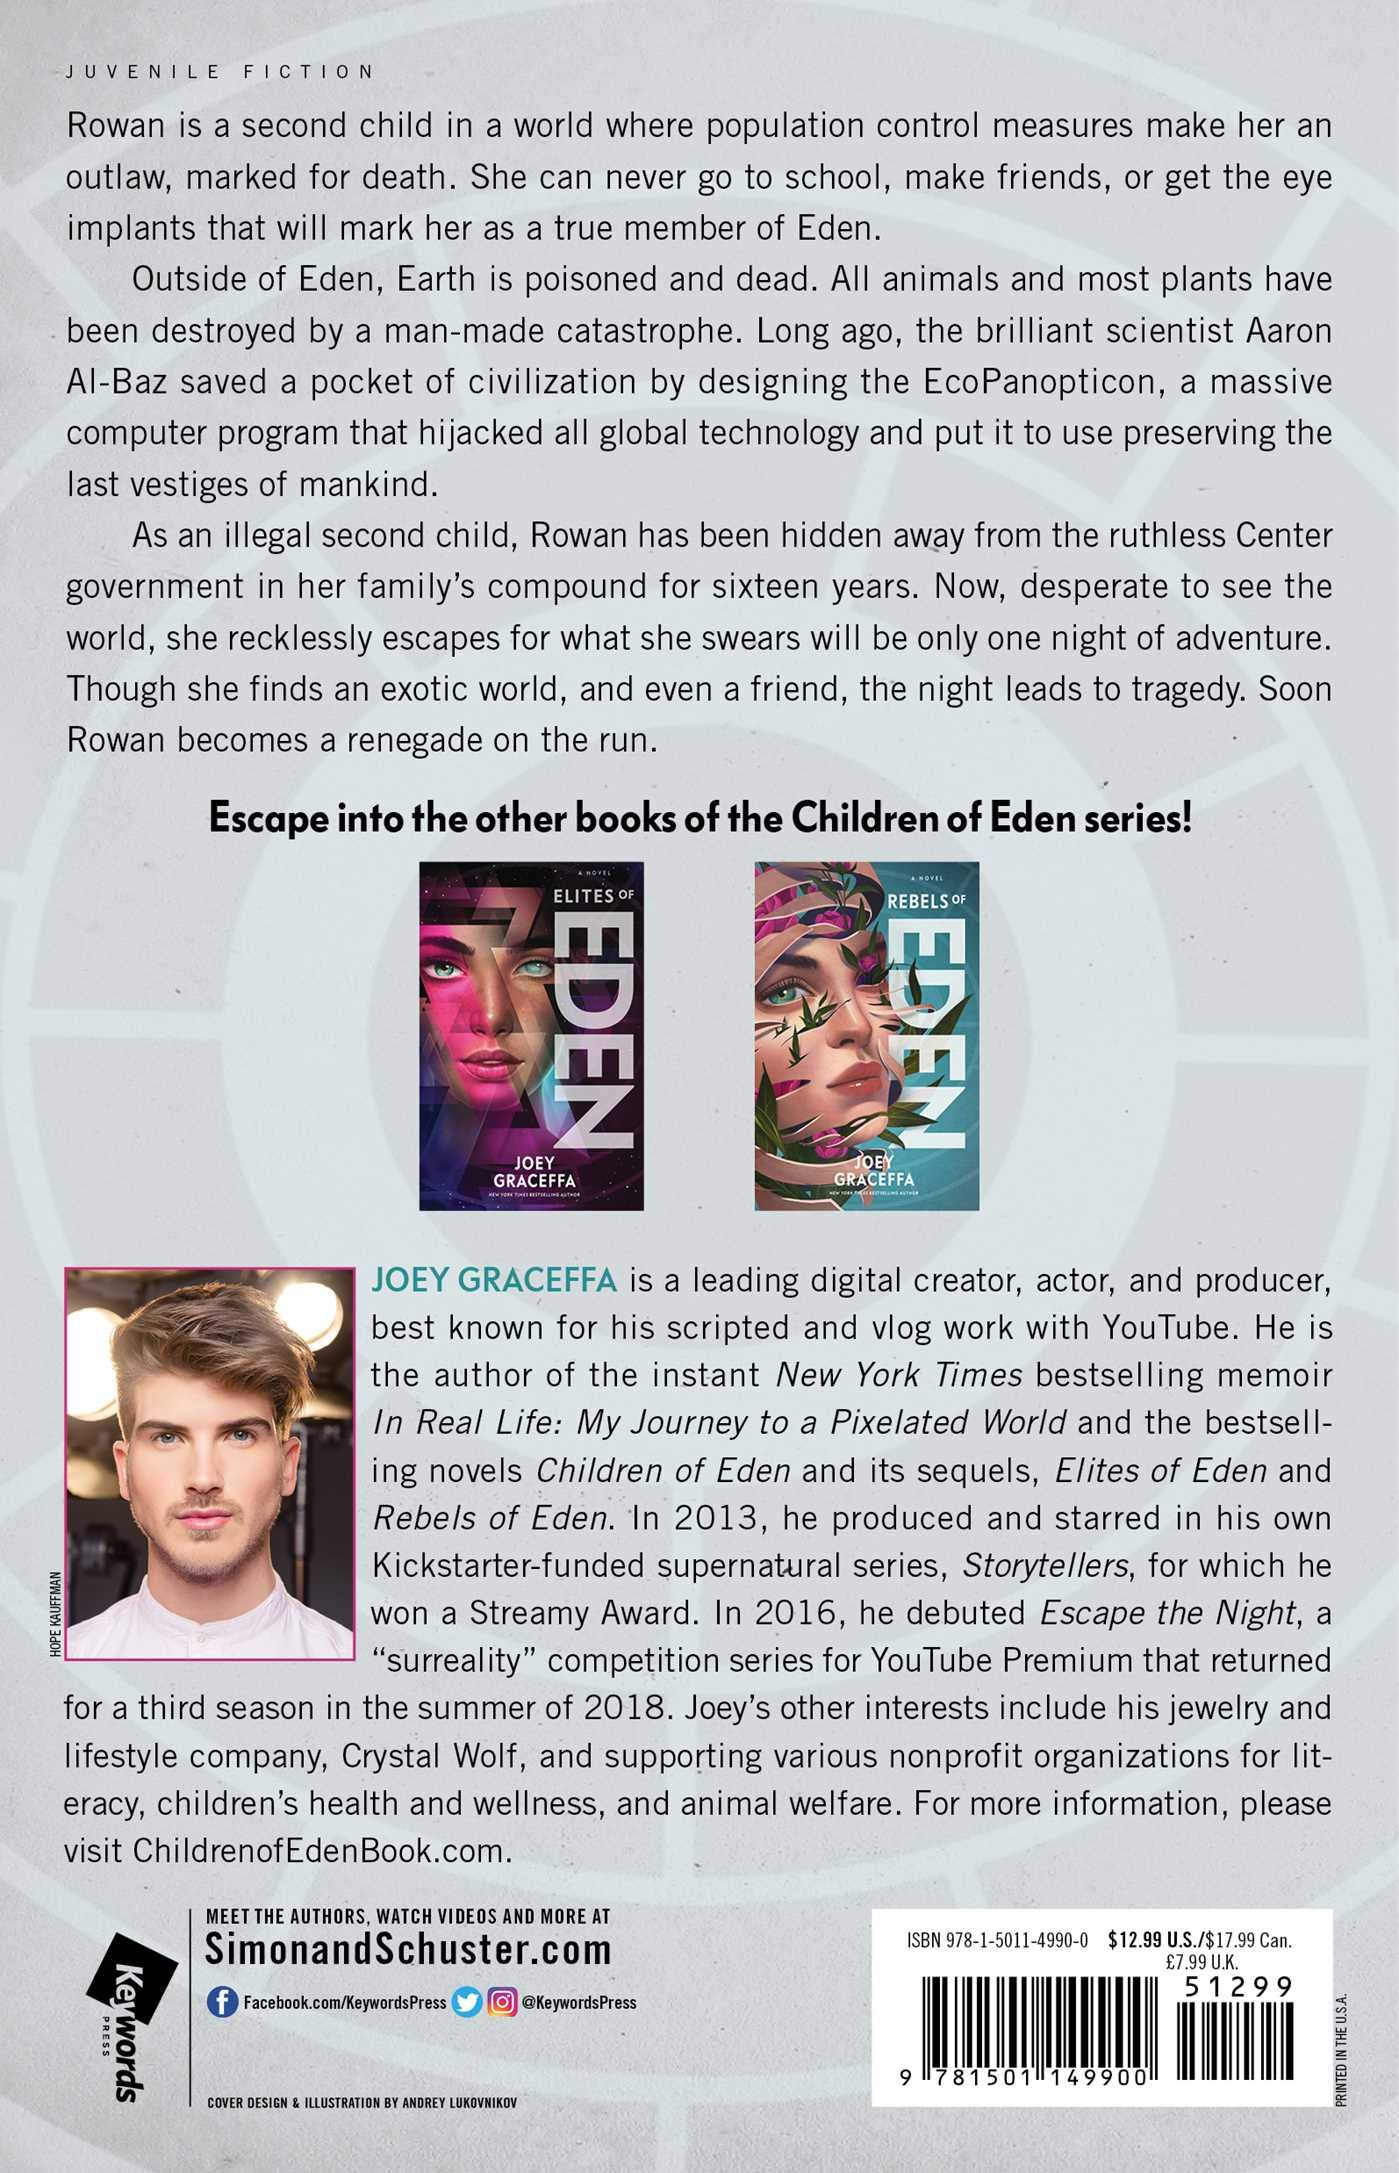 Amazon.com: Children of Eden: A Novel (9781501149900): Joey Graceffa: Books